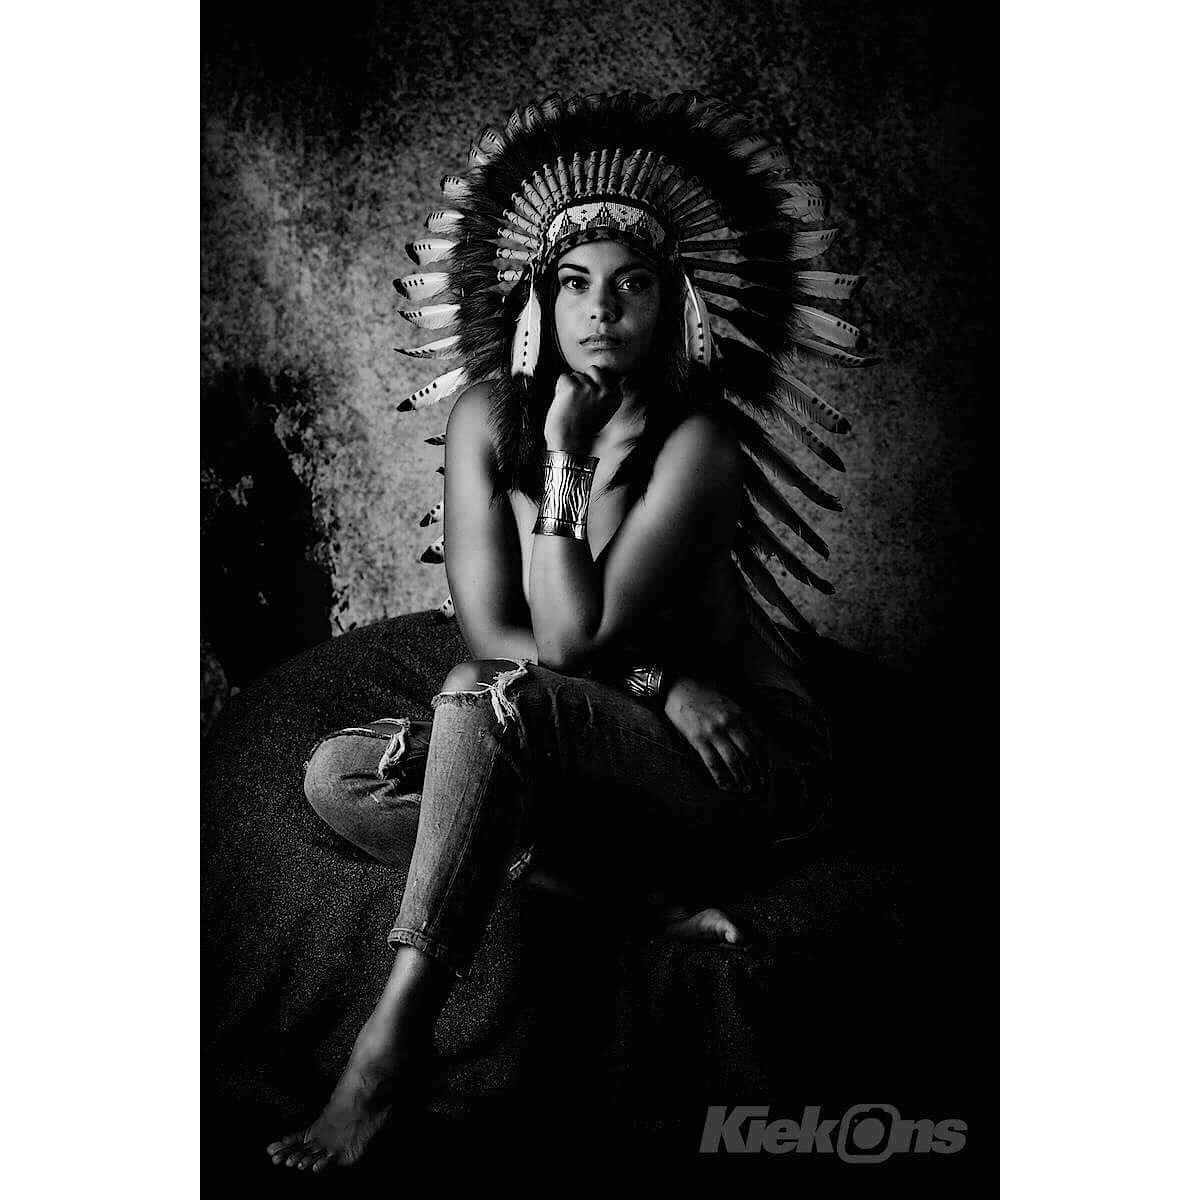 Indian girl 2 by Vlie_Gert